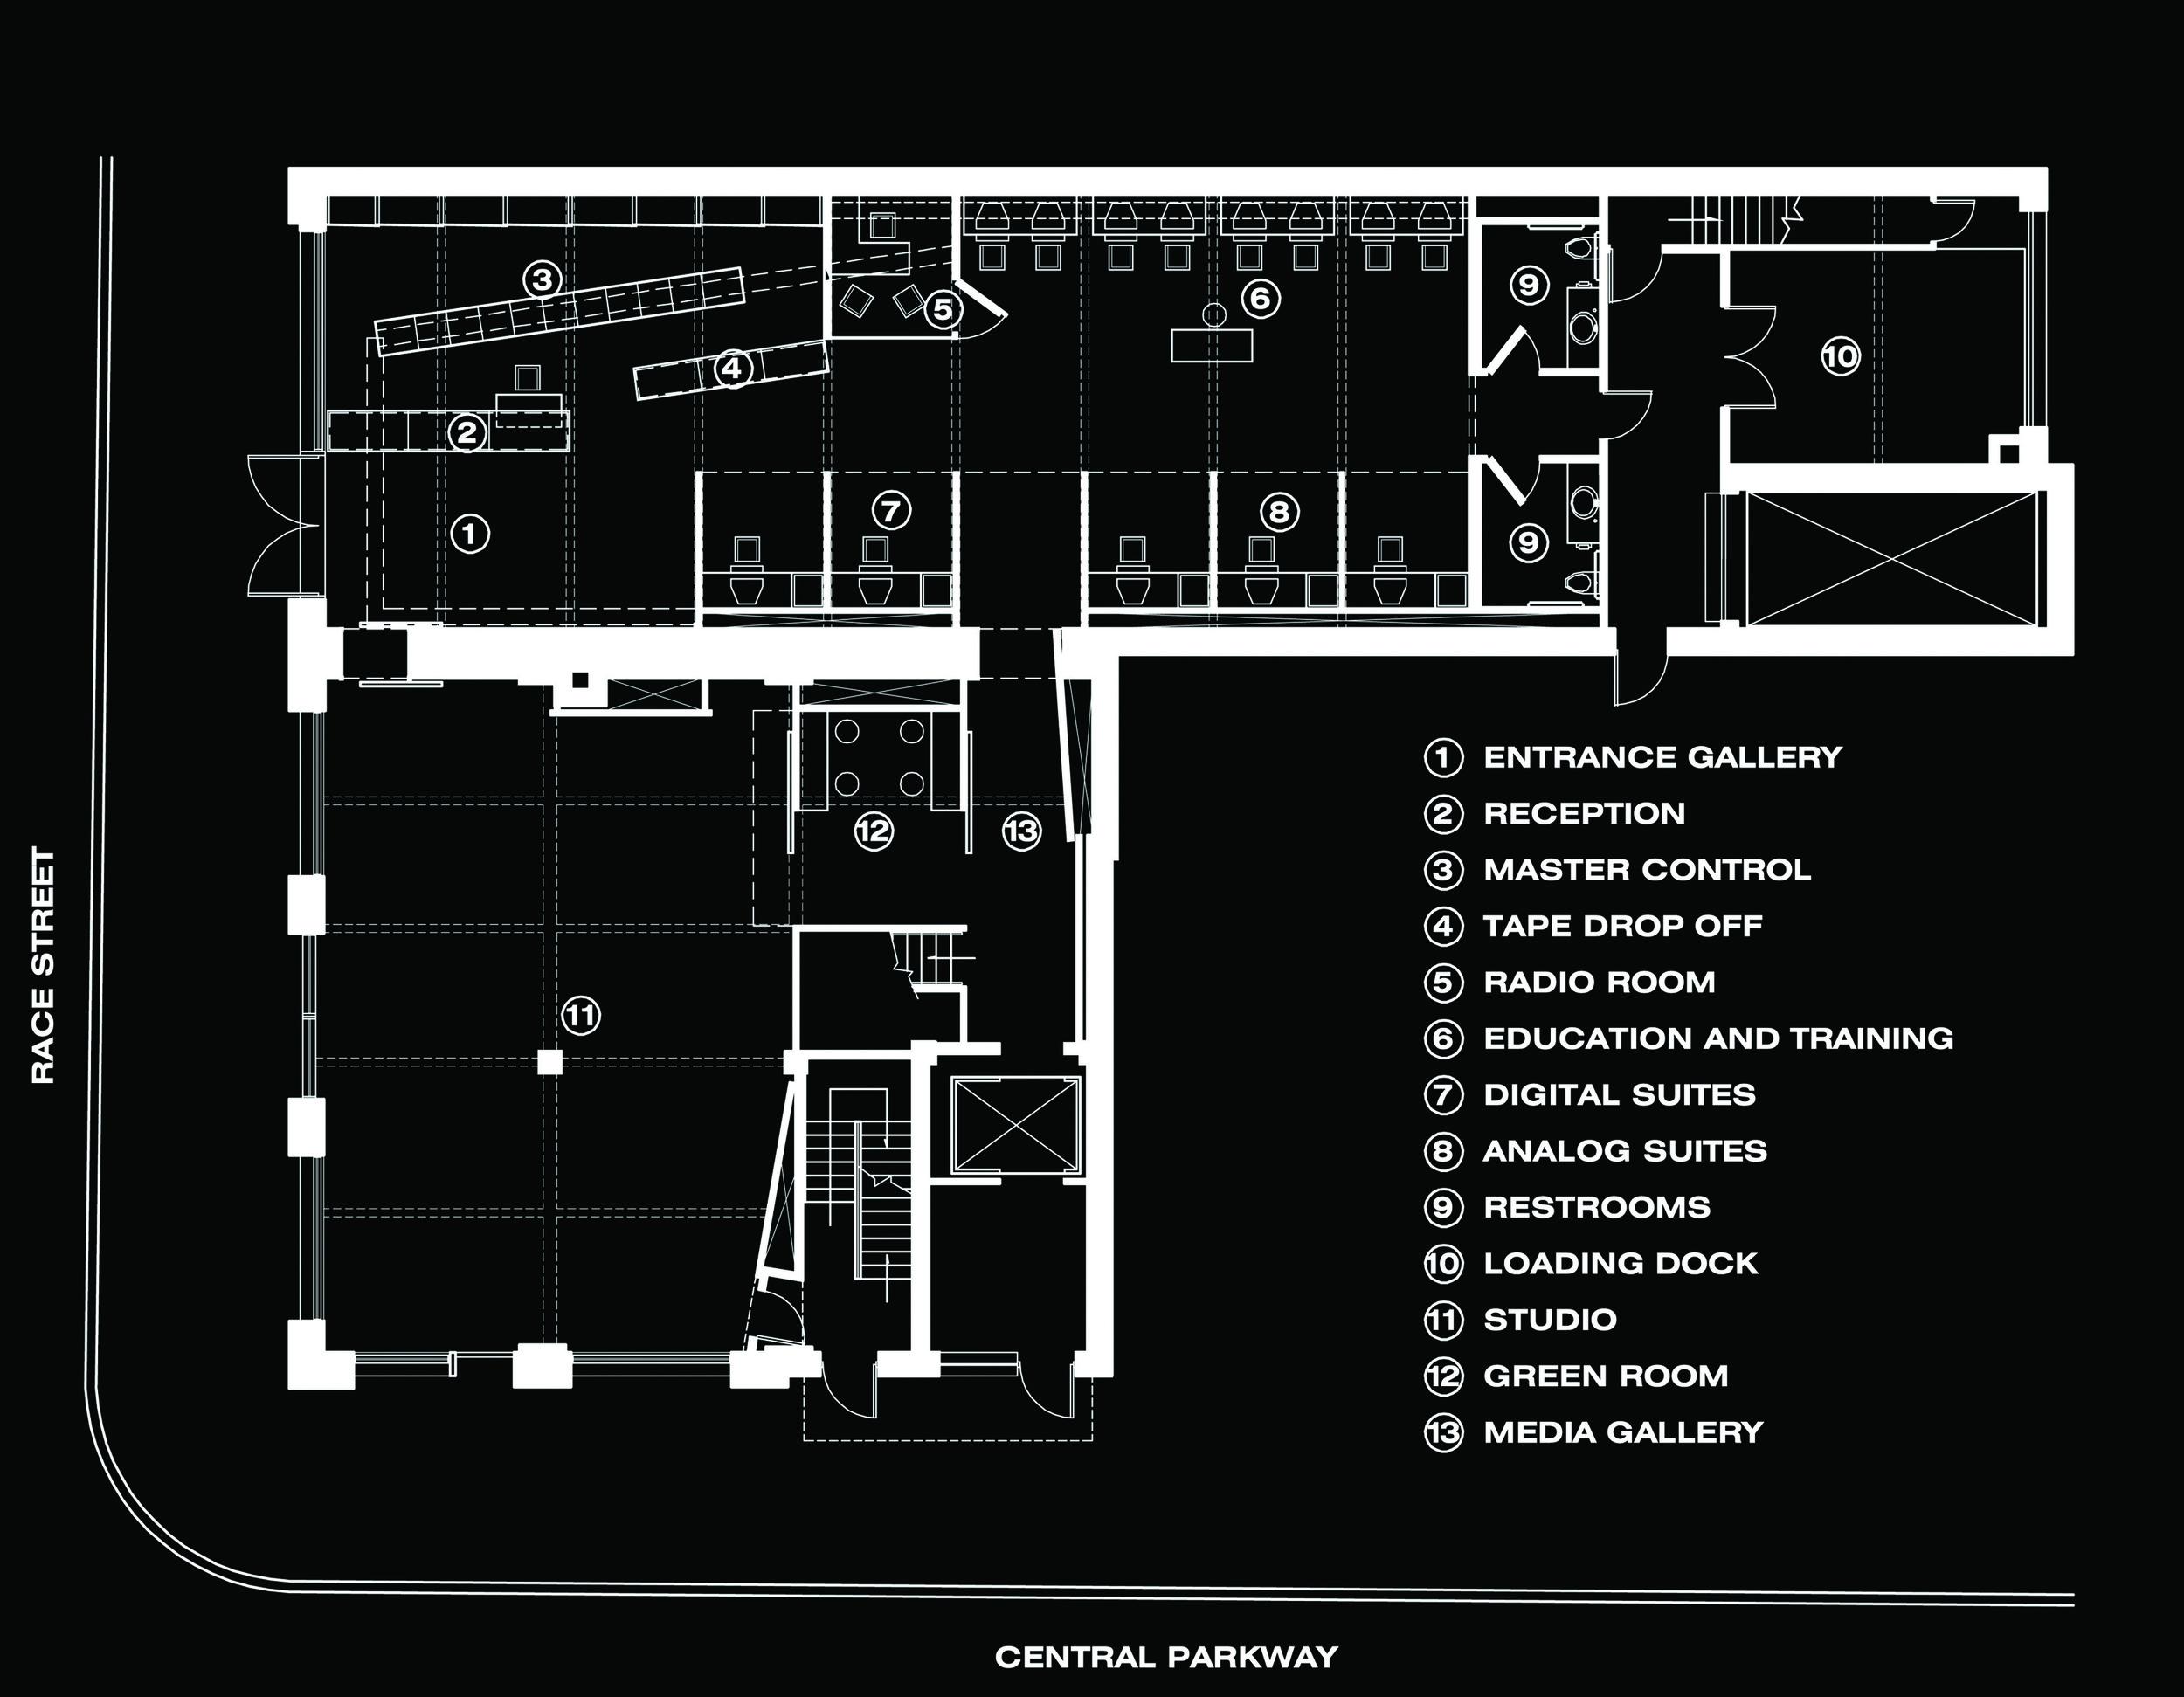 12_floor plan.jpg